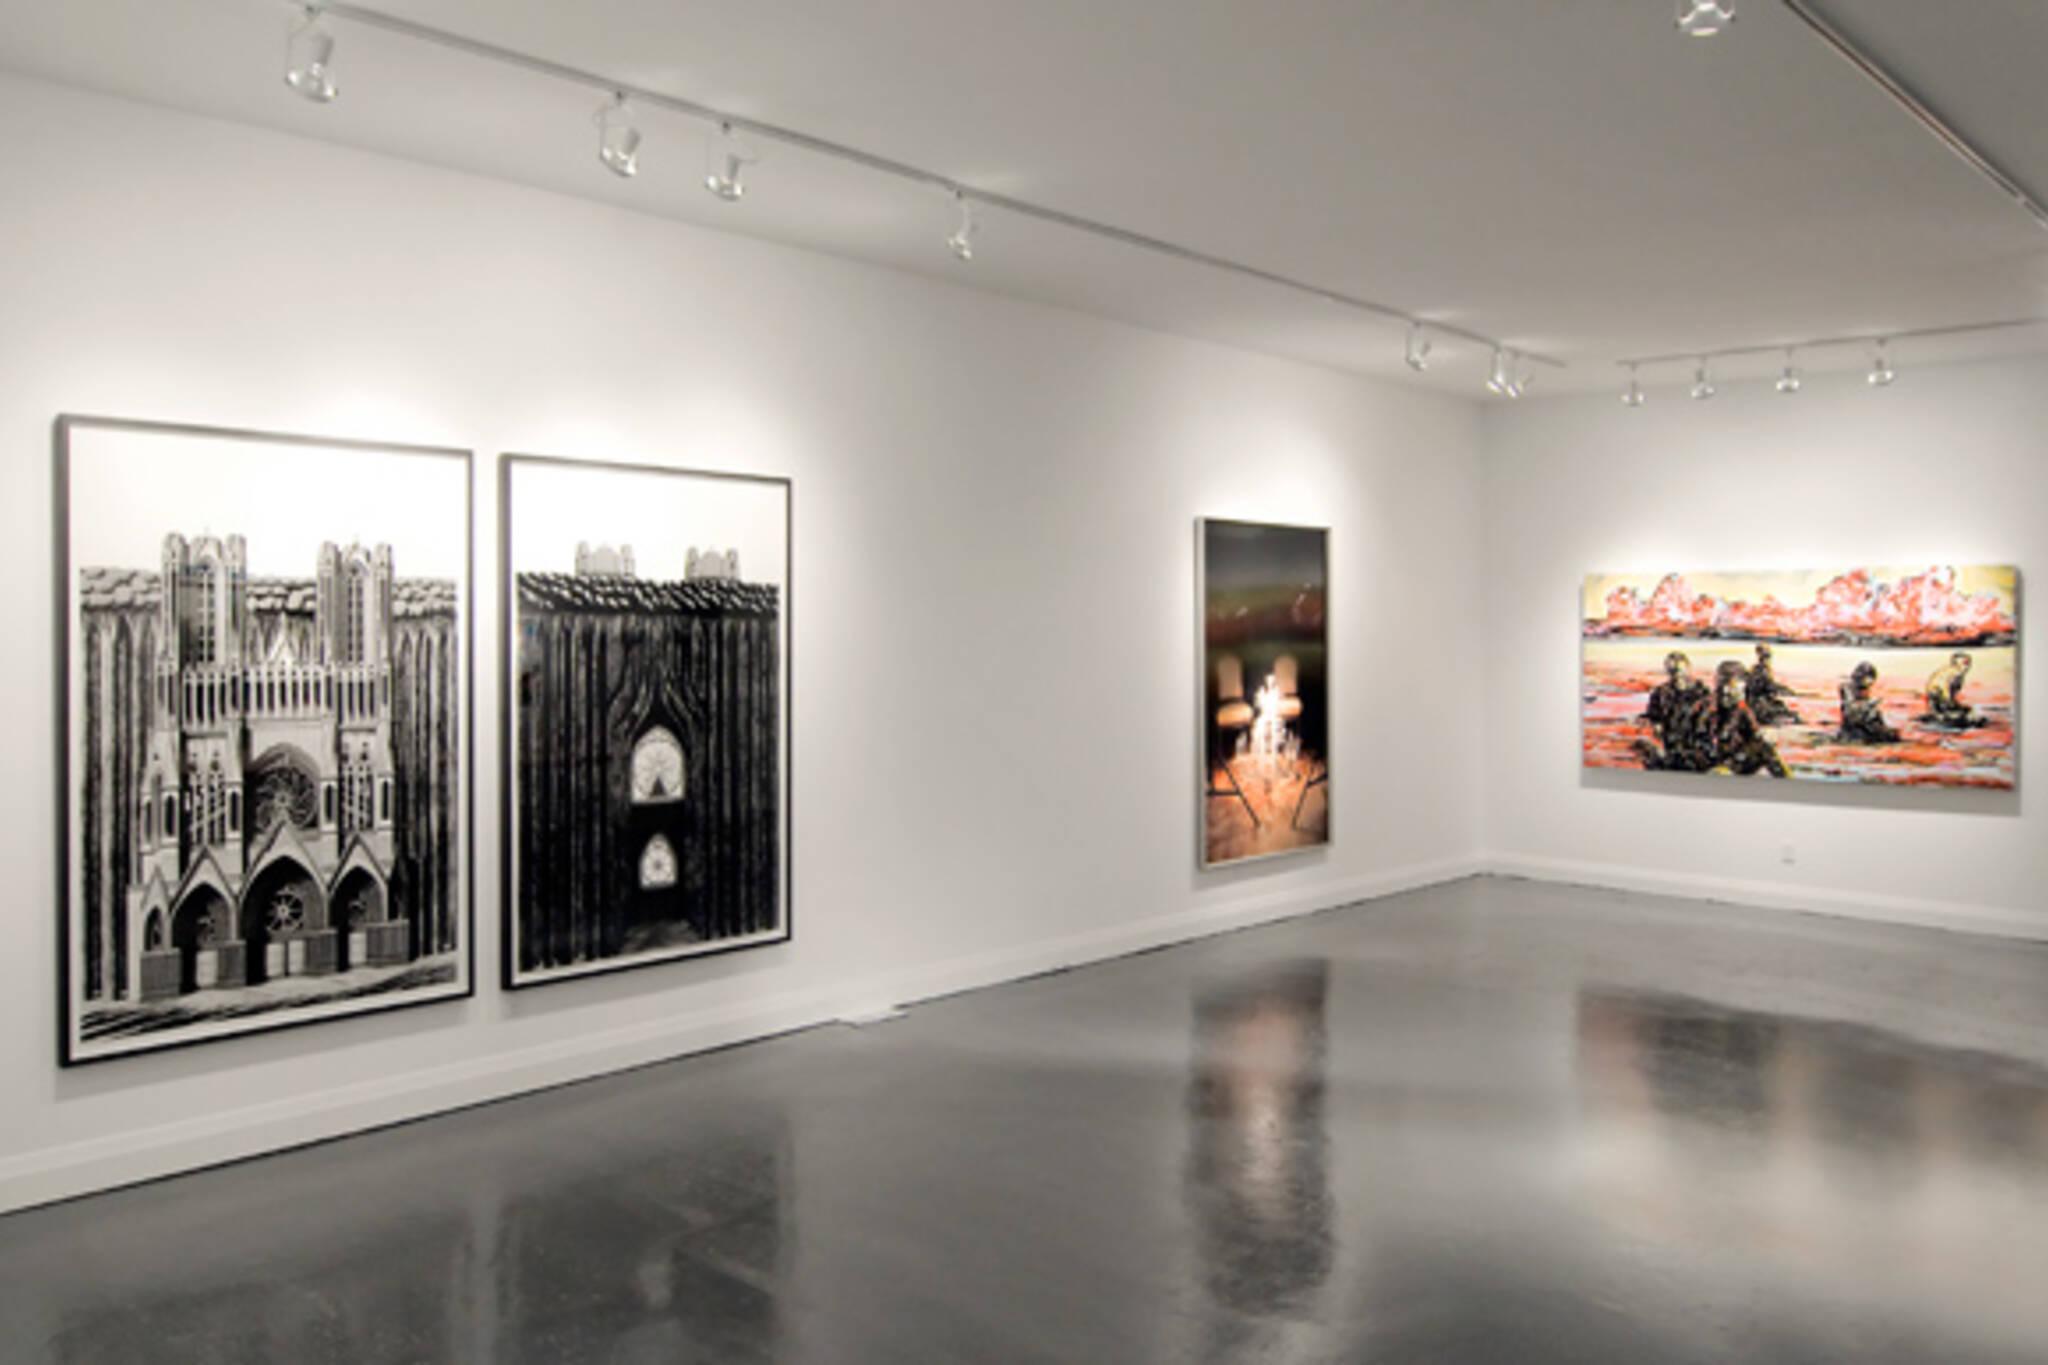 Ossington Art Gallery